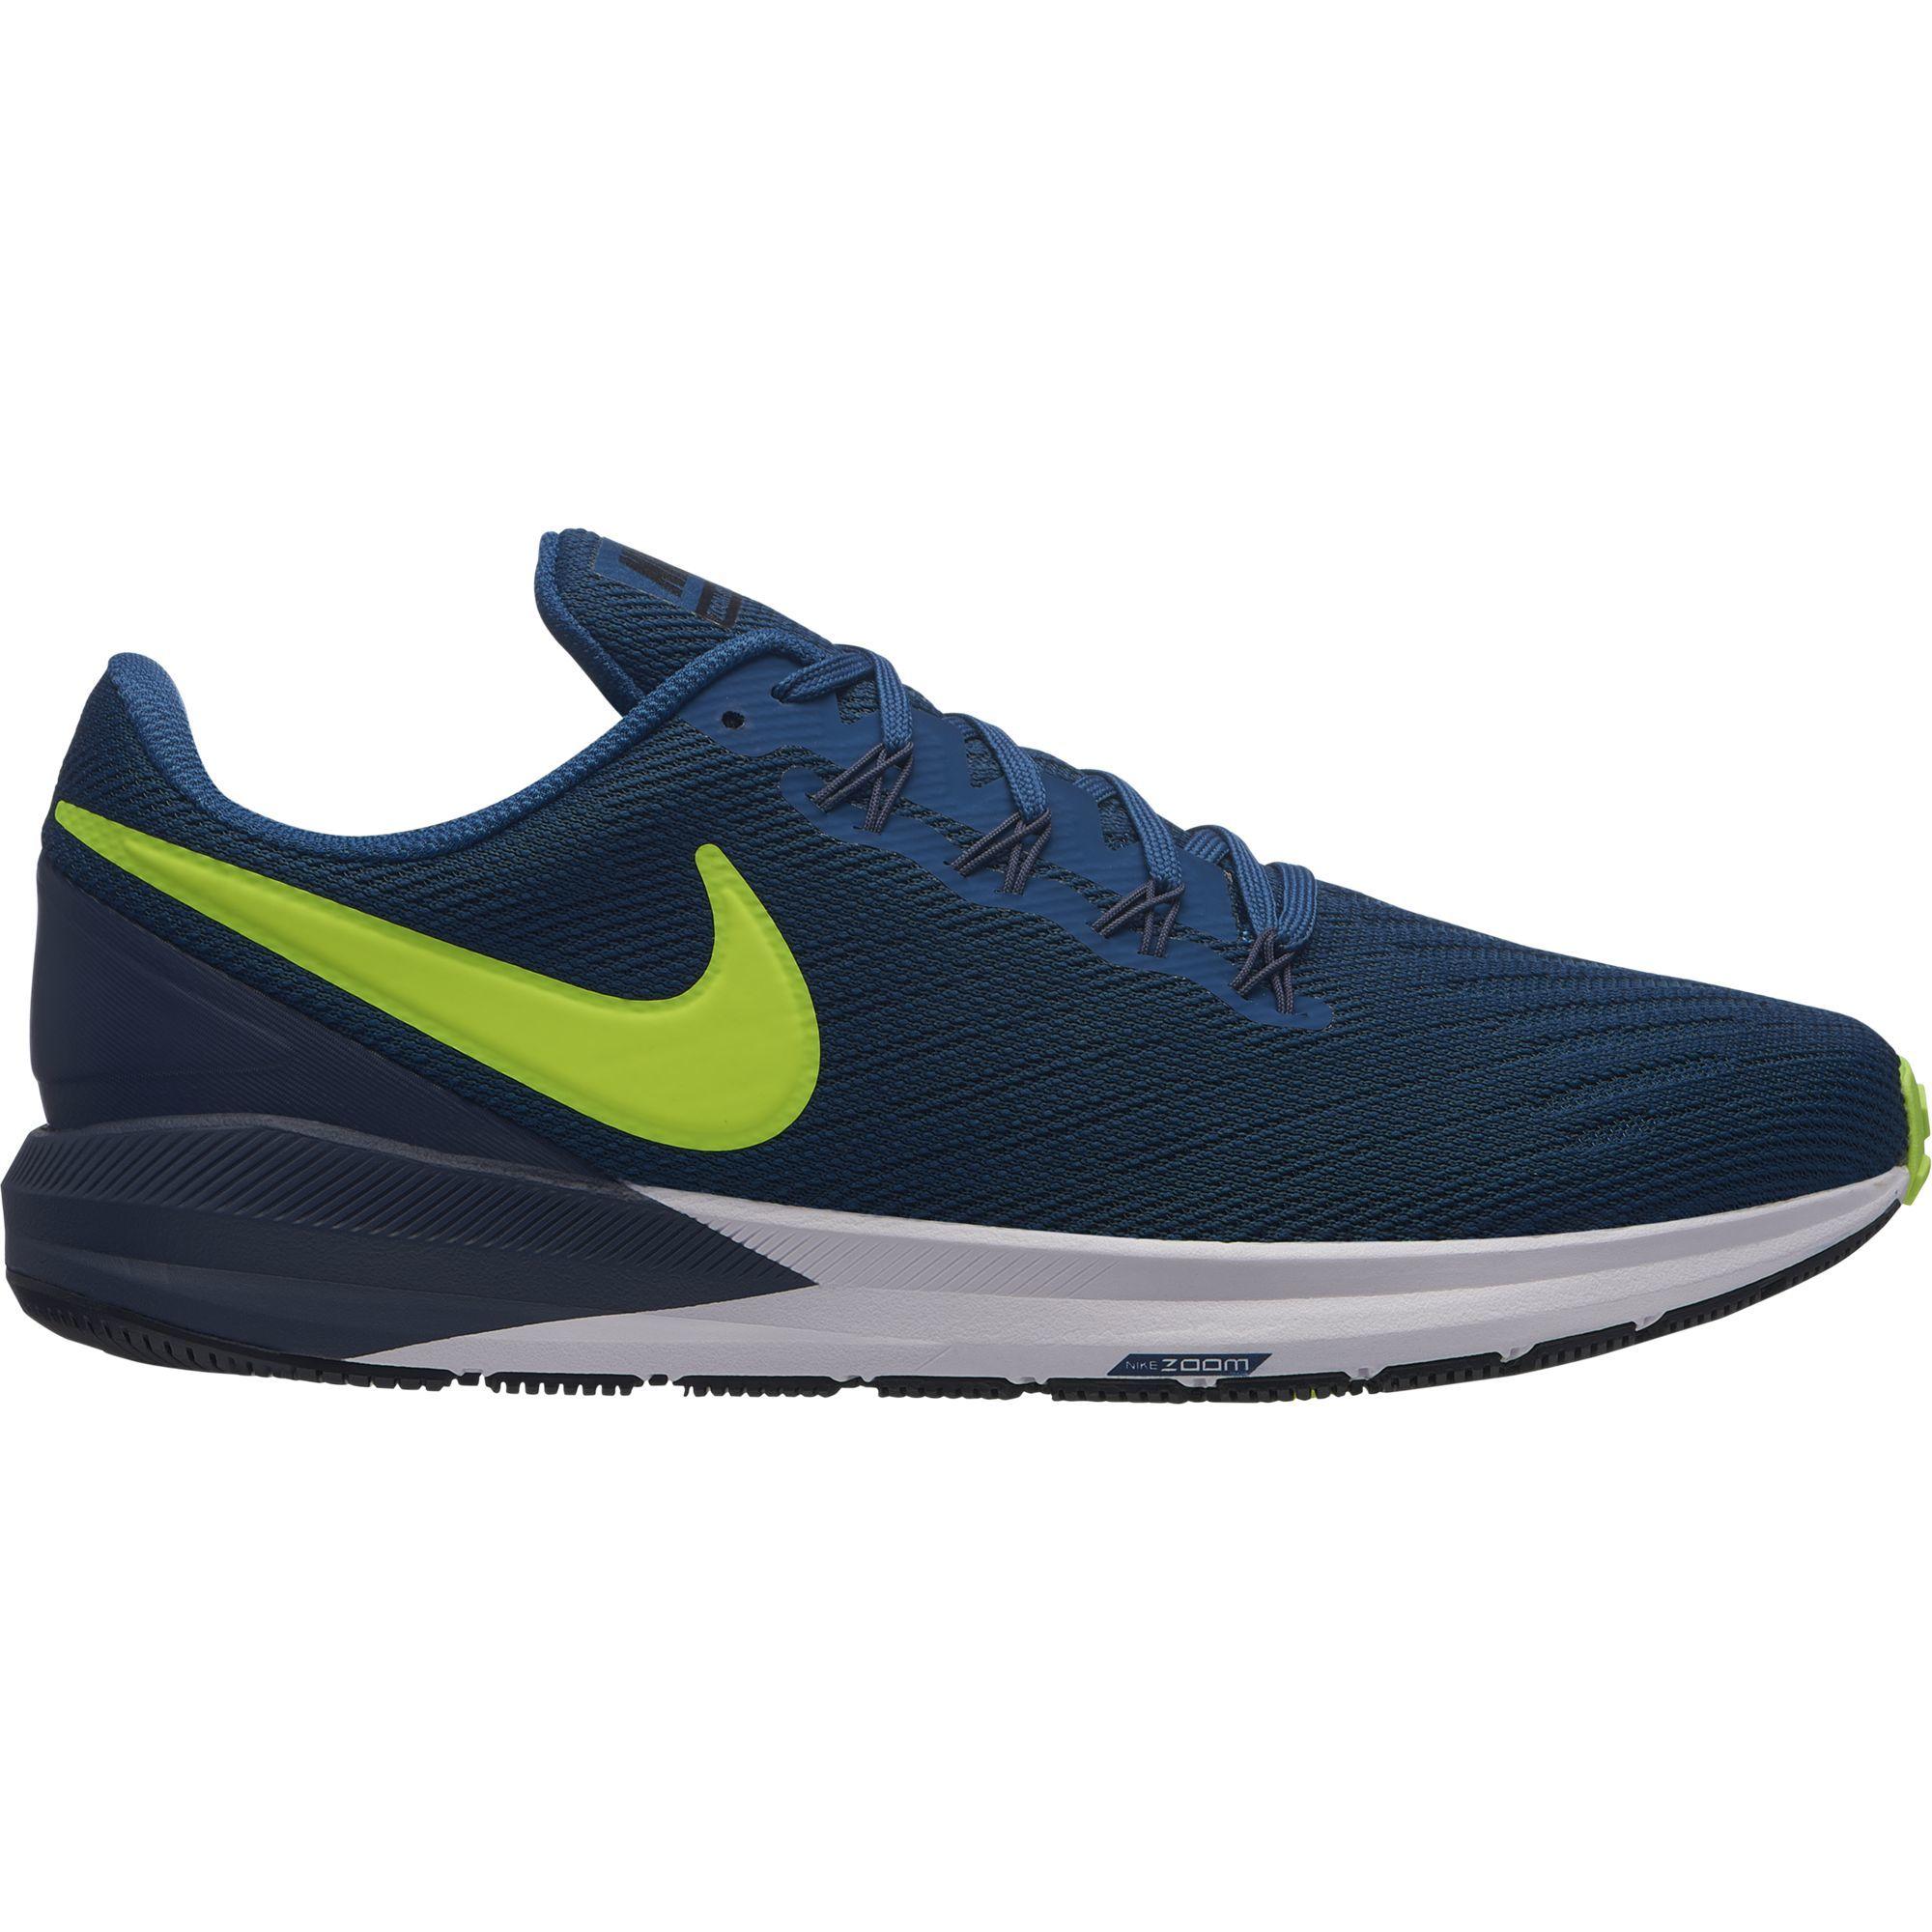 Nike Air Zoom Structure 22 in Blau